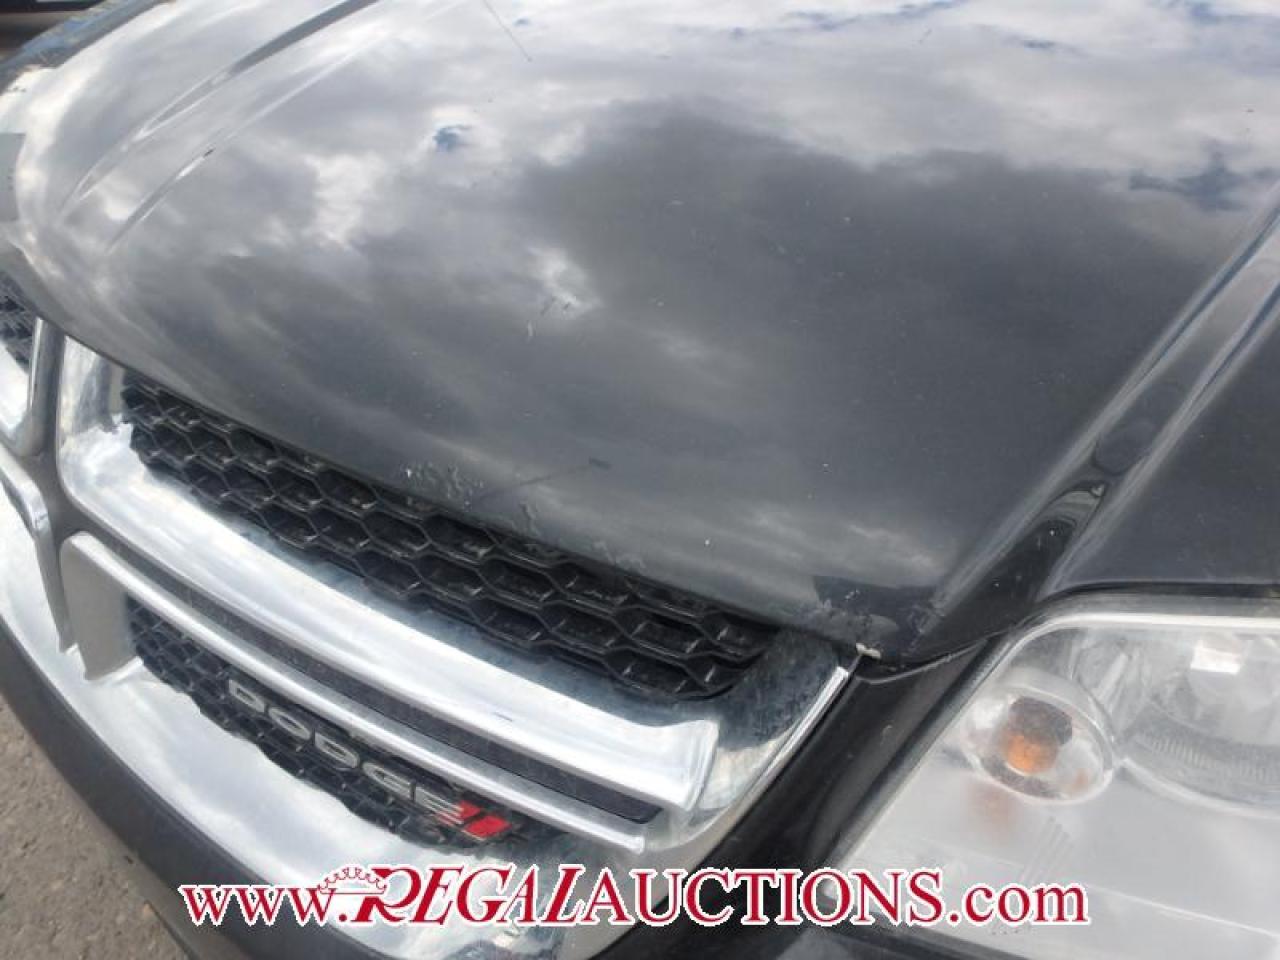 2012 Dodge GRAND CARAVAN SXT WAGON 7PASS 3.6L